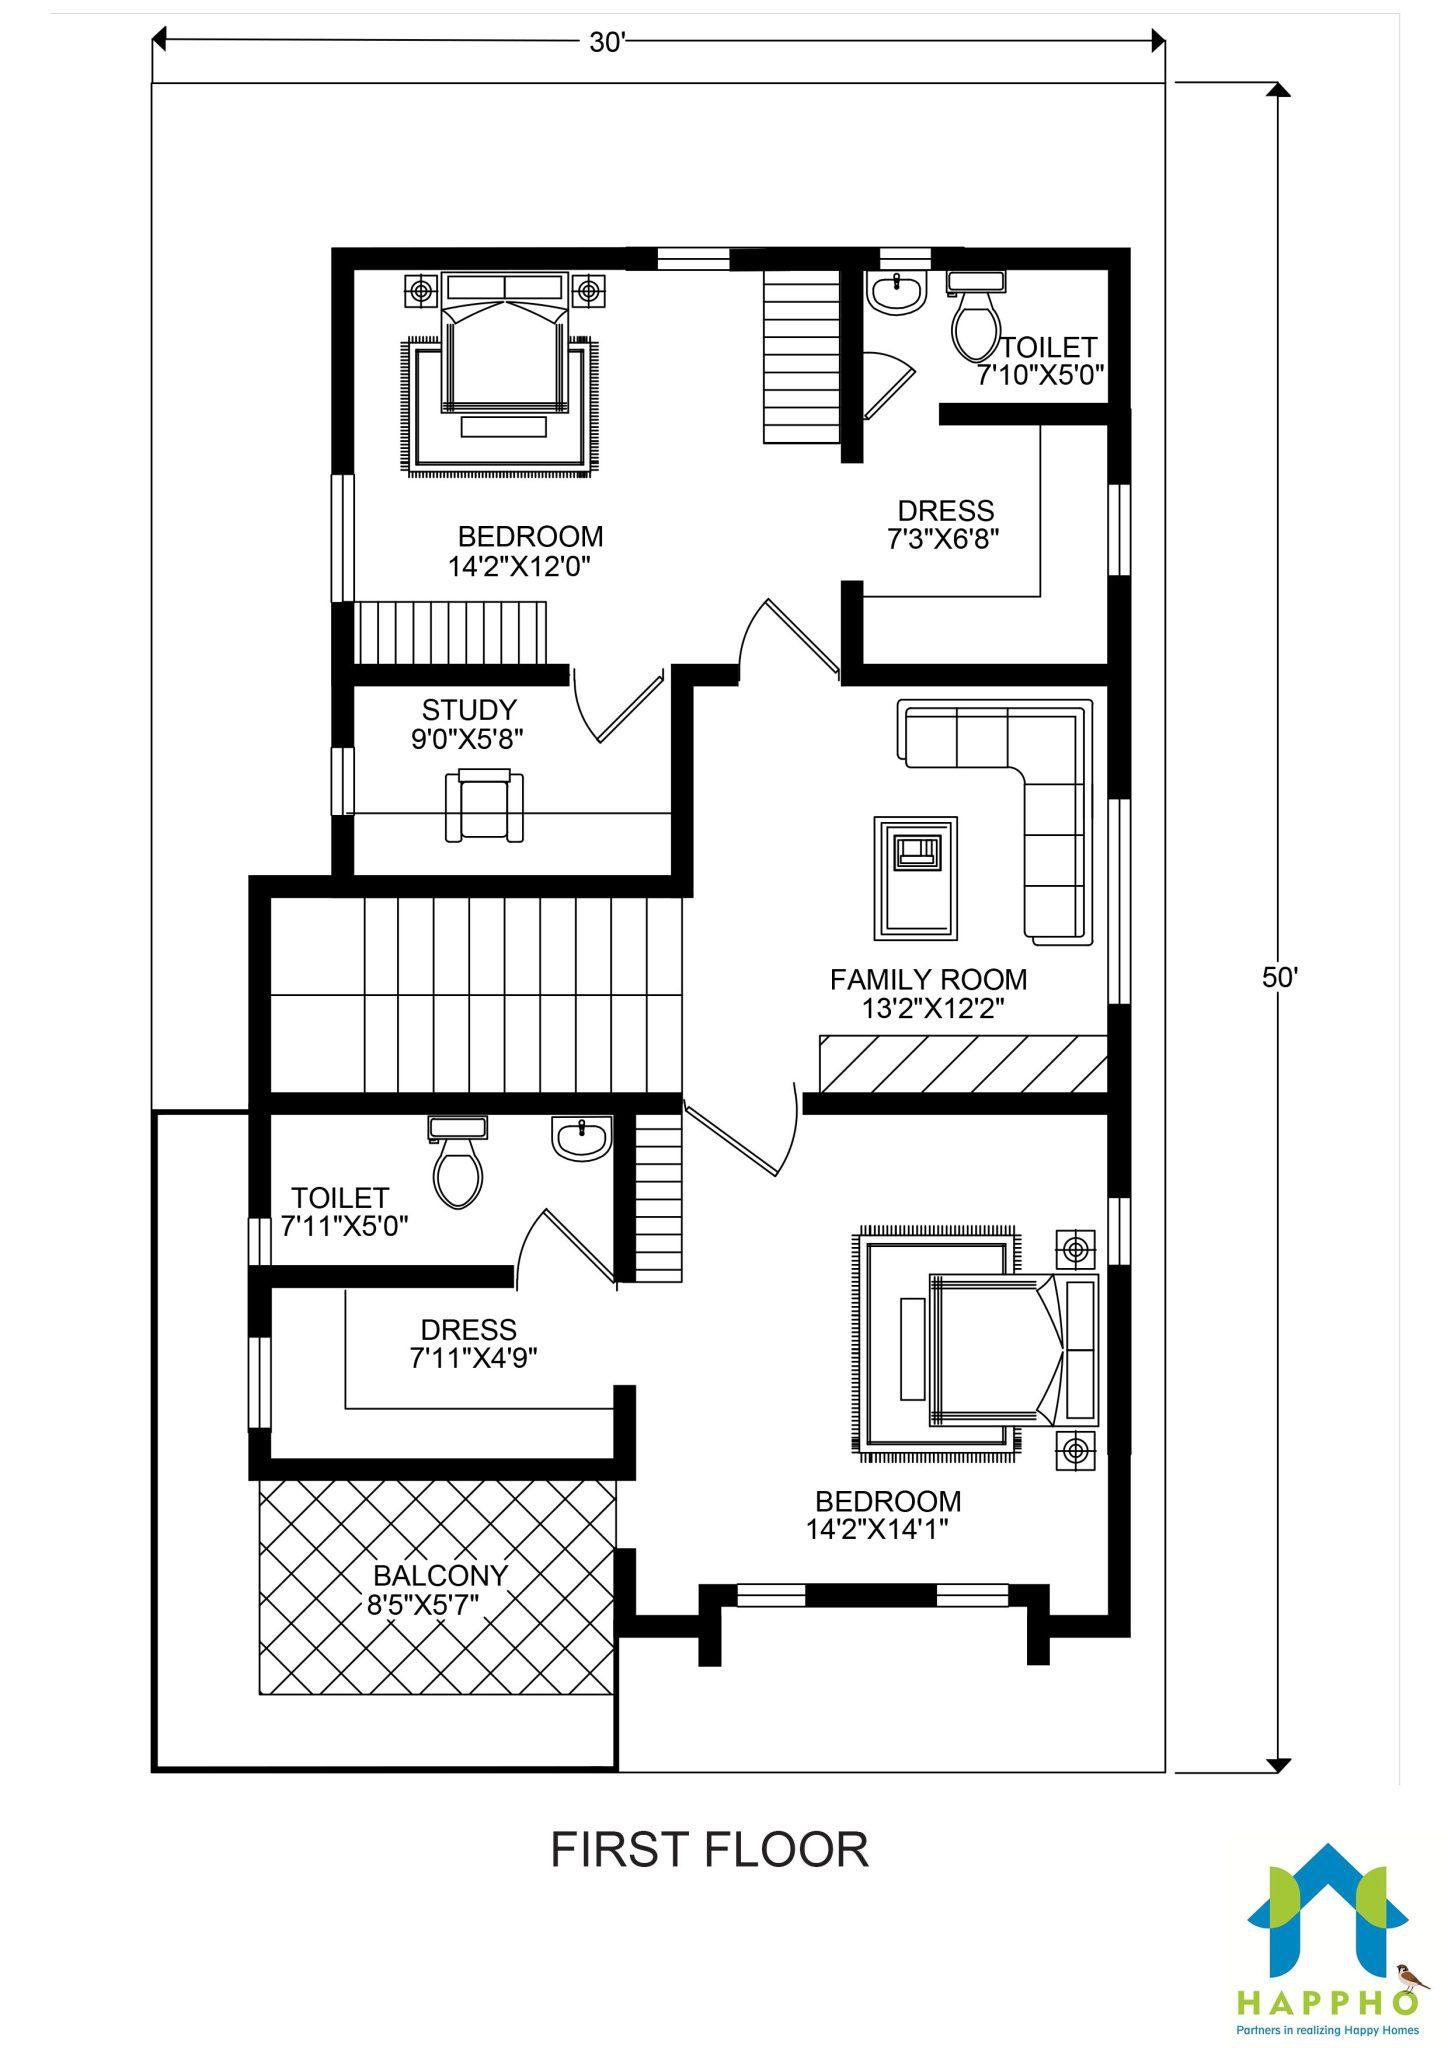 Floor Plan For 30 X 50 Feet Plot 3 Bhk 1500 Square Feet 167 Sq